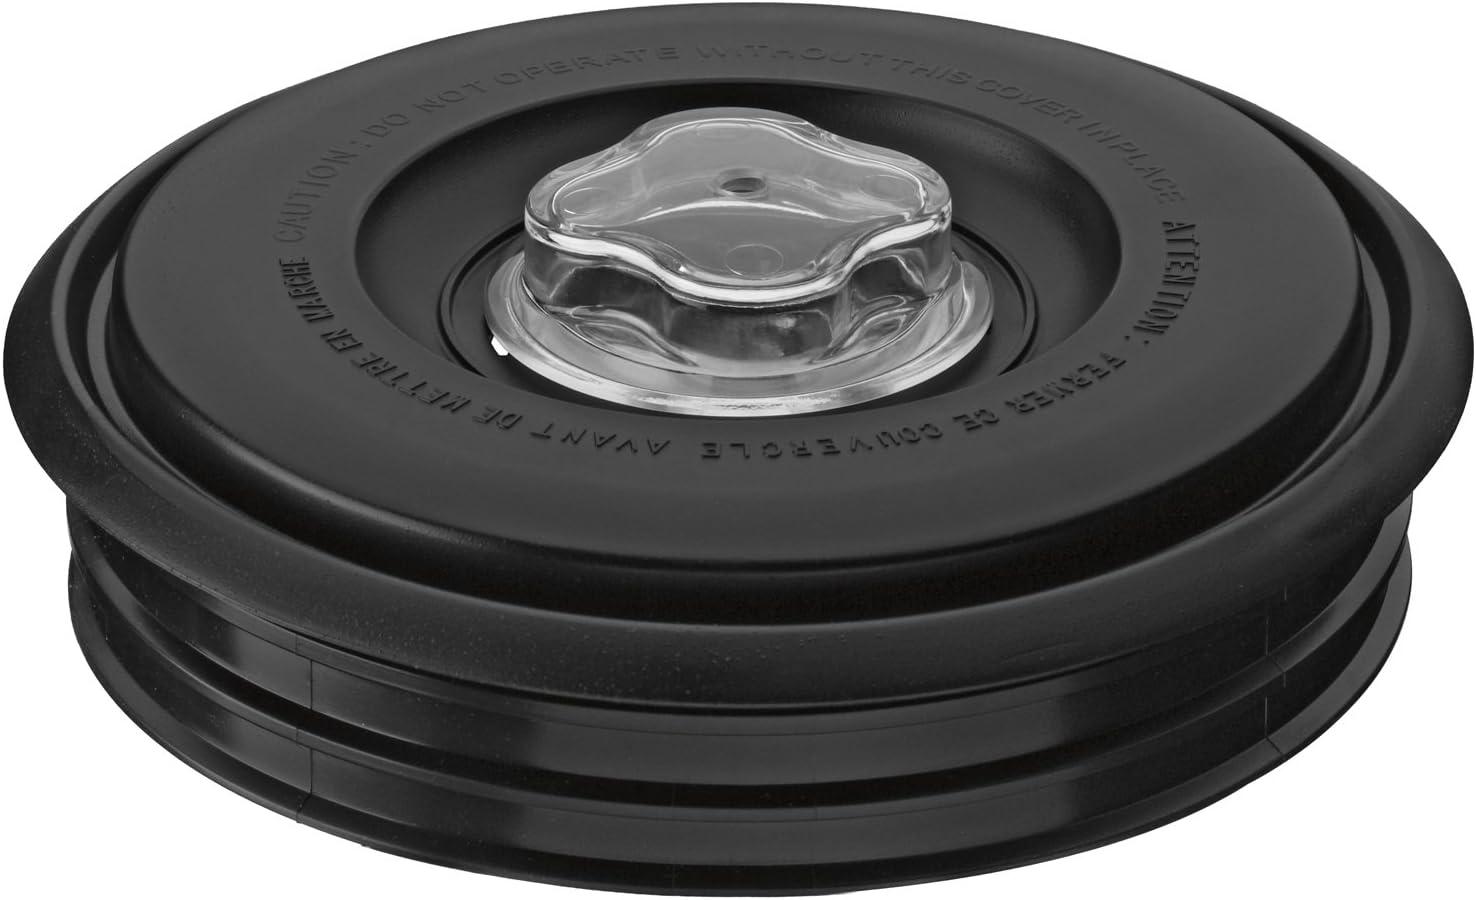 Waring Commercial CAC77 Blender Jar Vinyl Lid, 1-Gallon